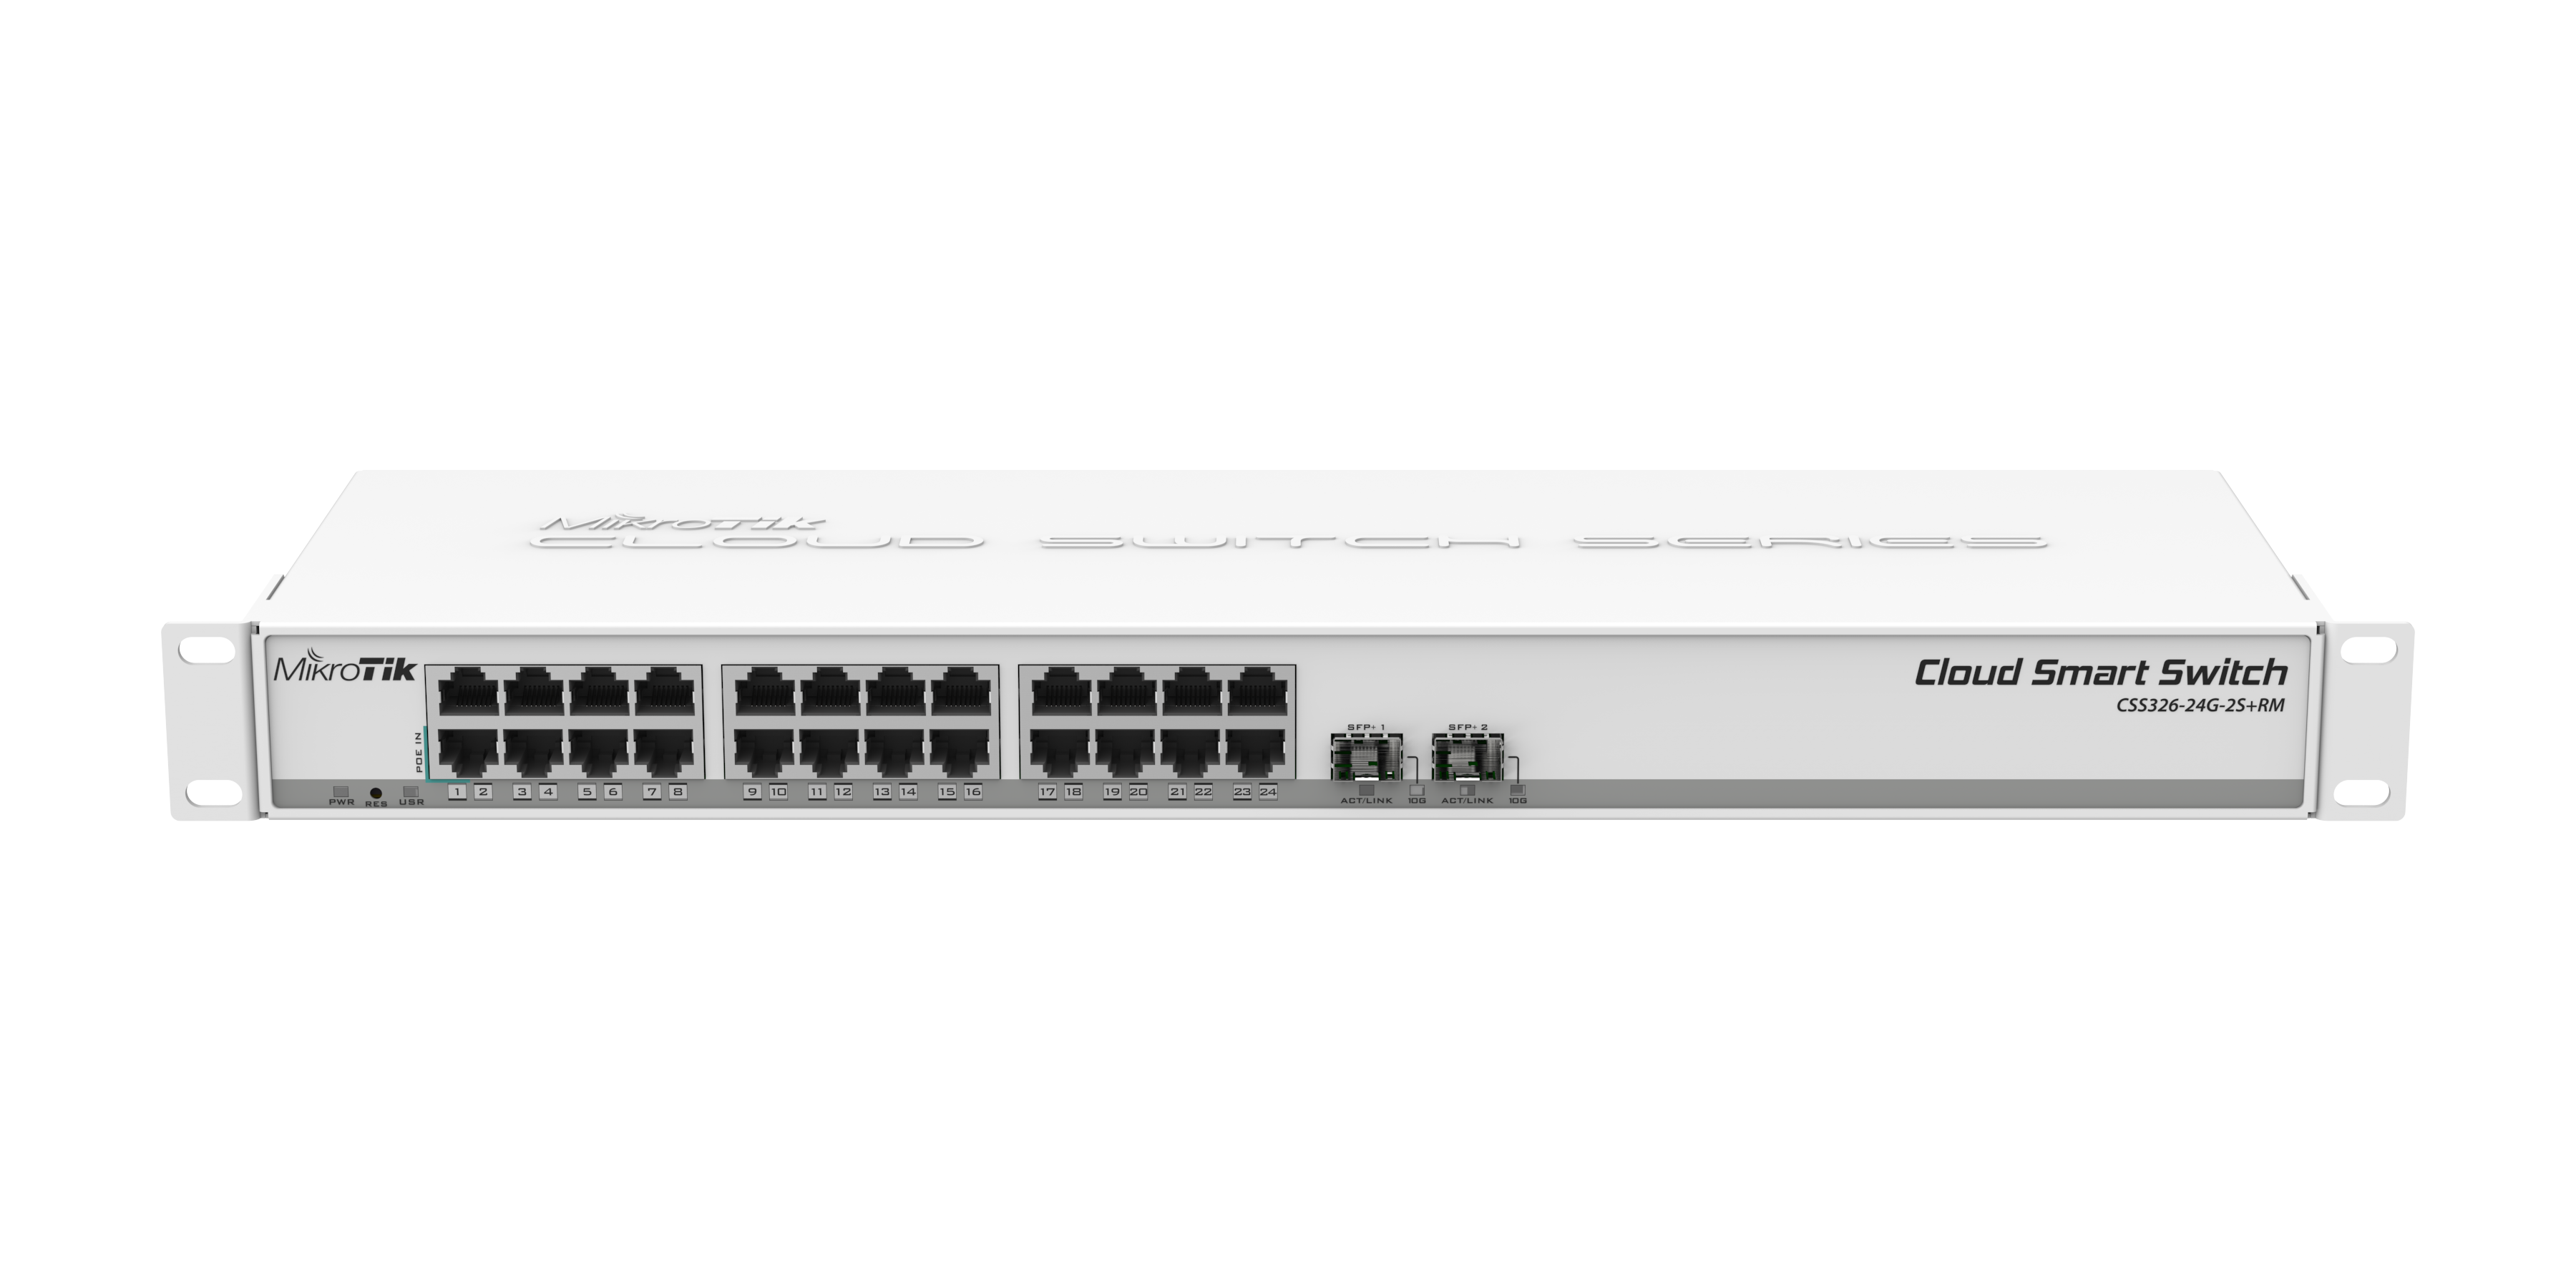 CSS326-24G-2SplusRM CSS326-24G-2S+RM Cloud Smart Switch - SwOS 24 Port Gigabit Eth - 2 SFP+ 10Gbit Port